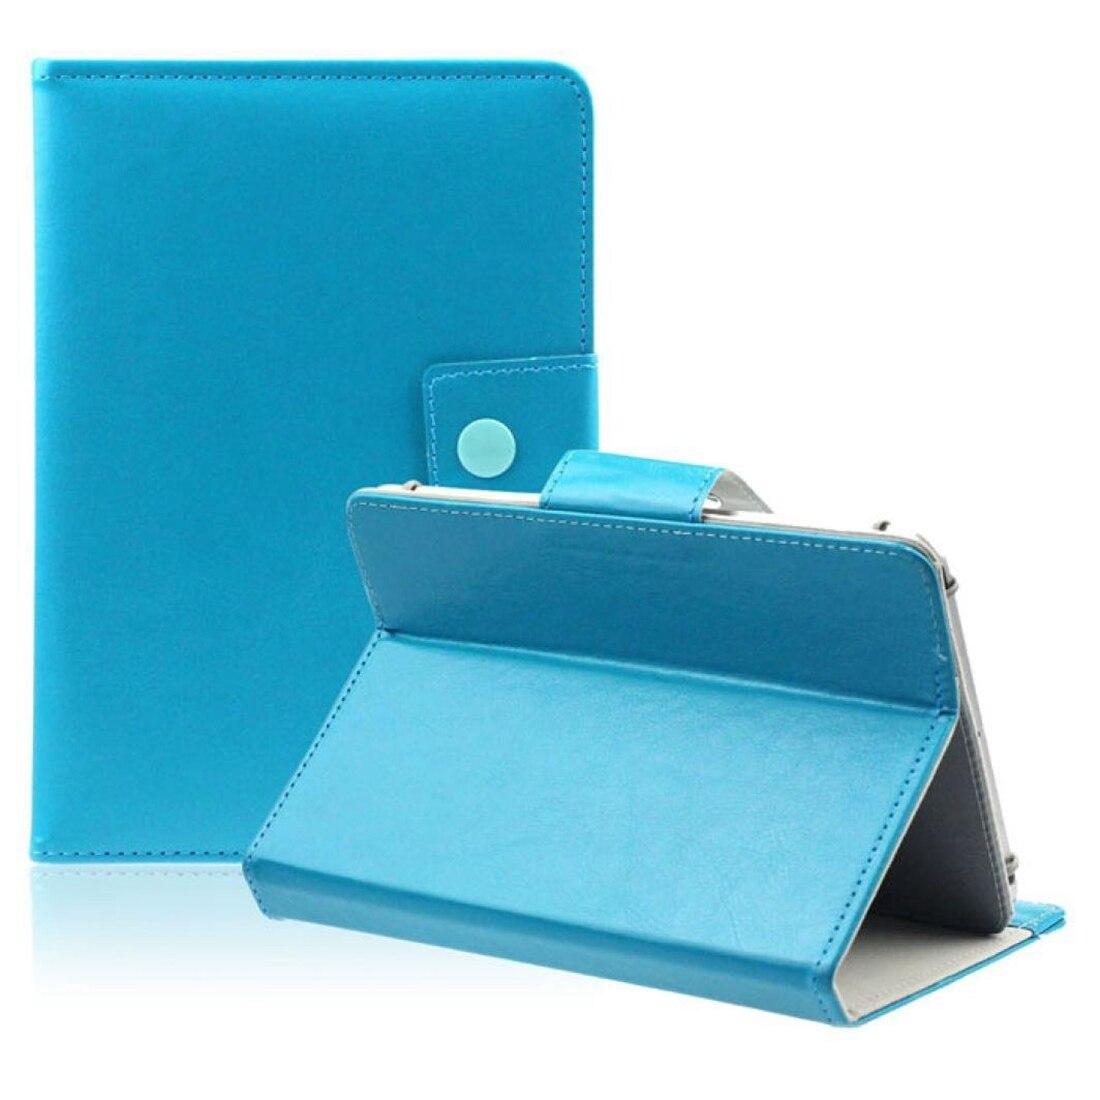 10 Inch Universal Tablet PC Case Crystal PU Leather Support Case (Blue) планшет модель g15 gpad tablet pc в донецке недорого